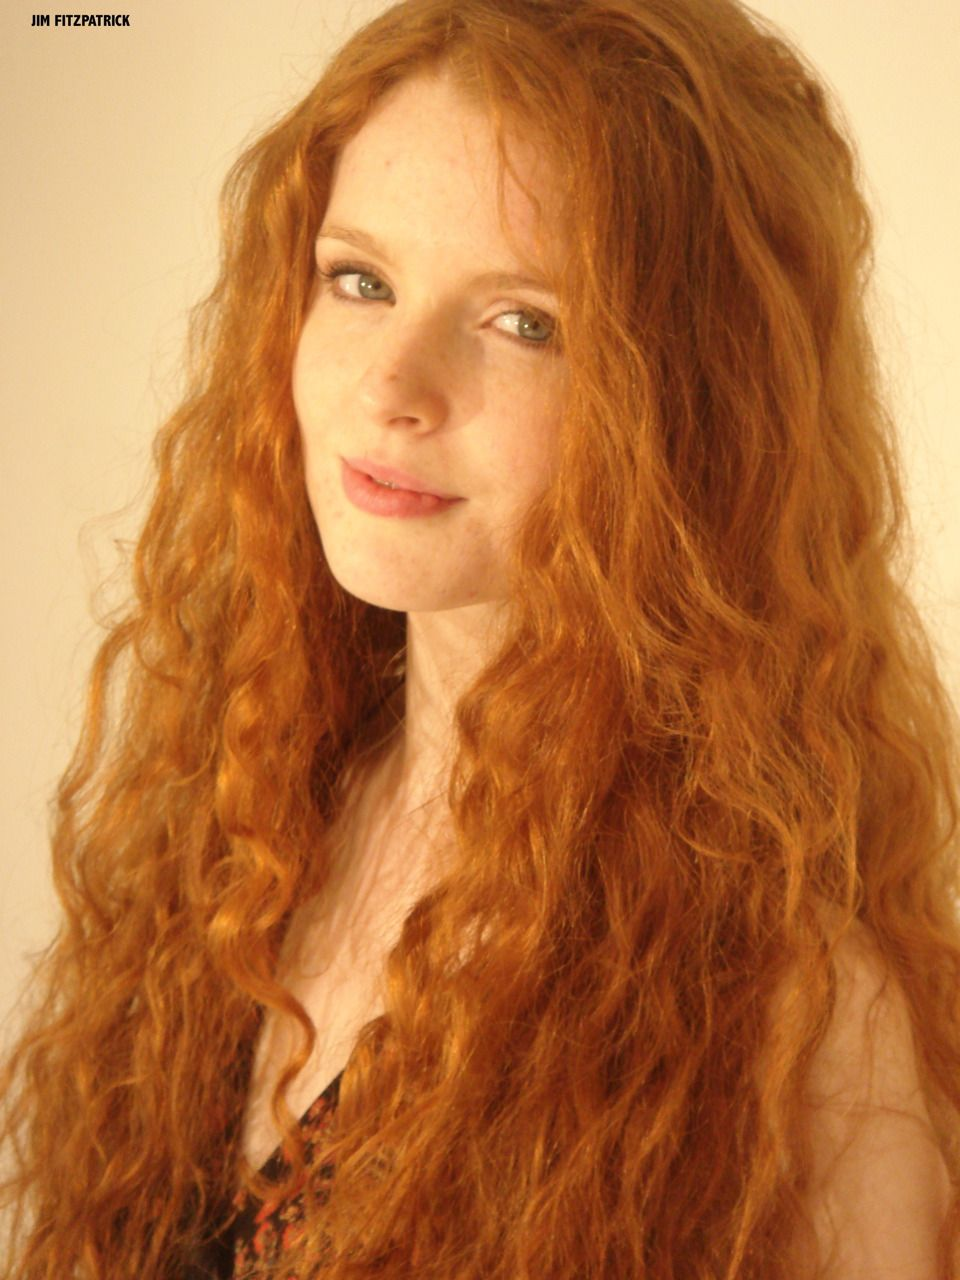 Irish redhead women